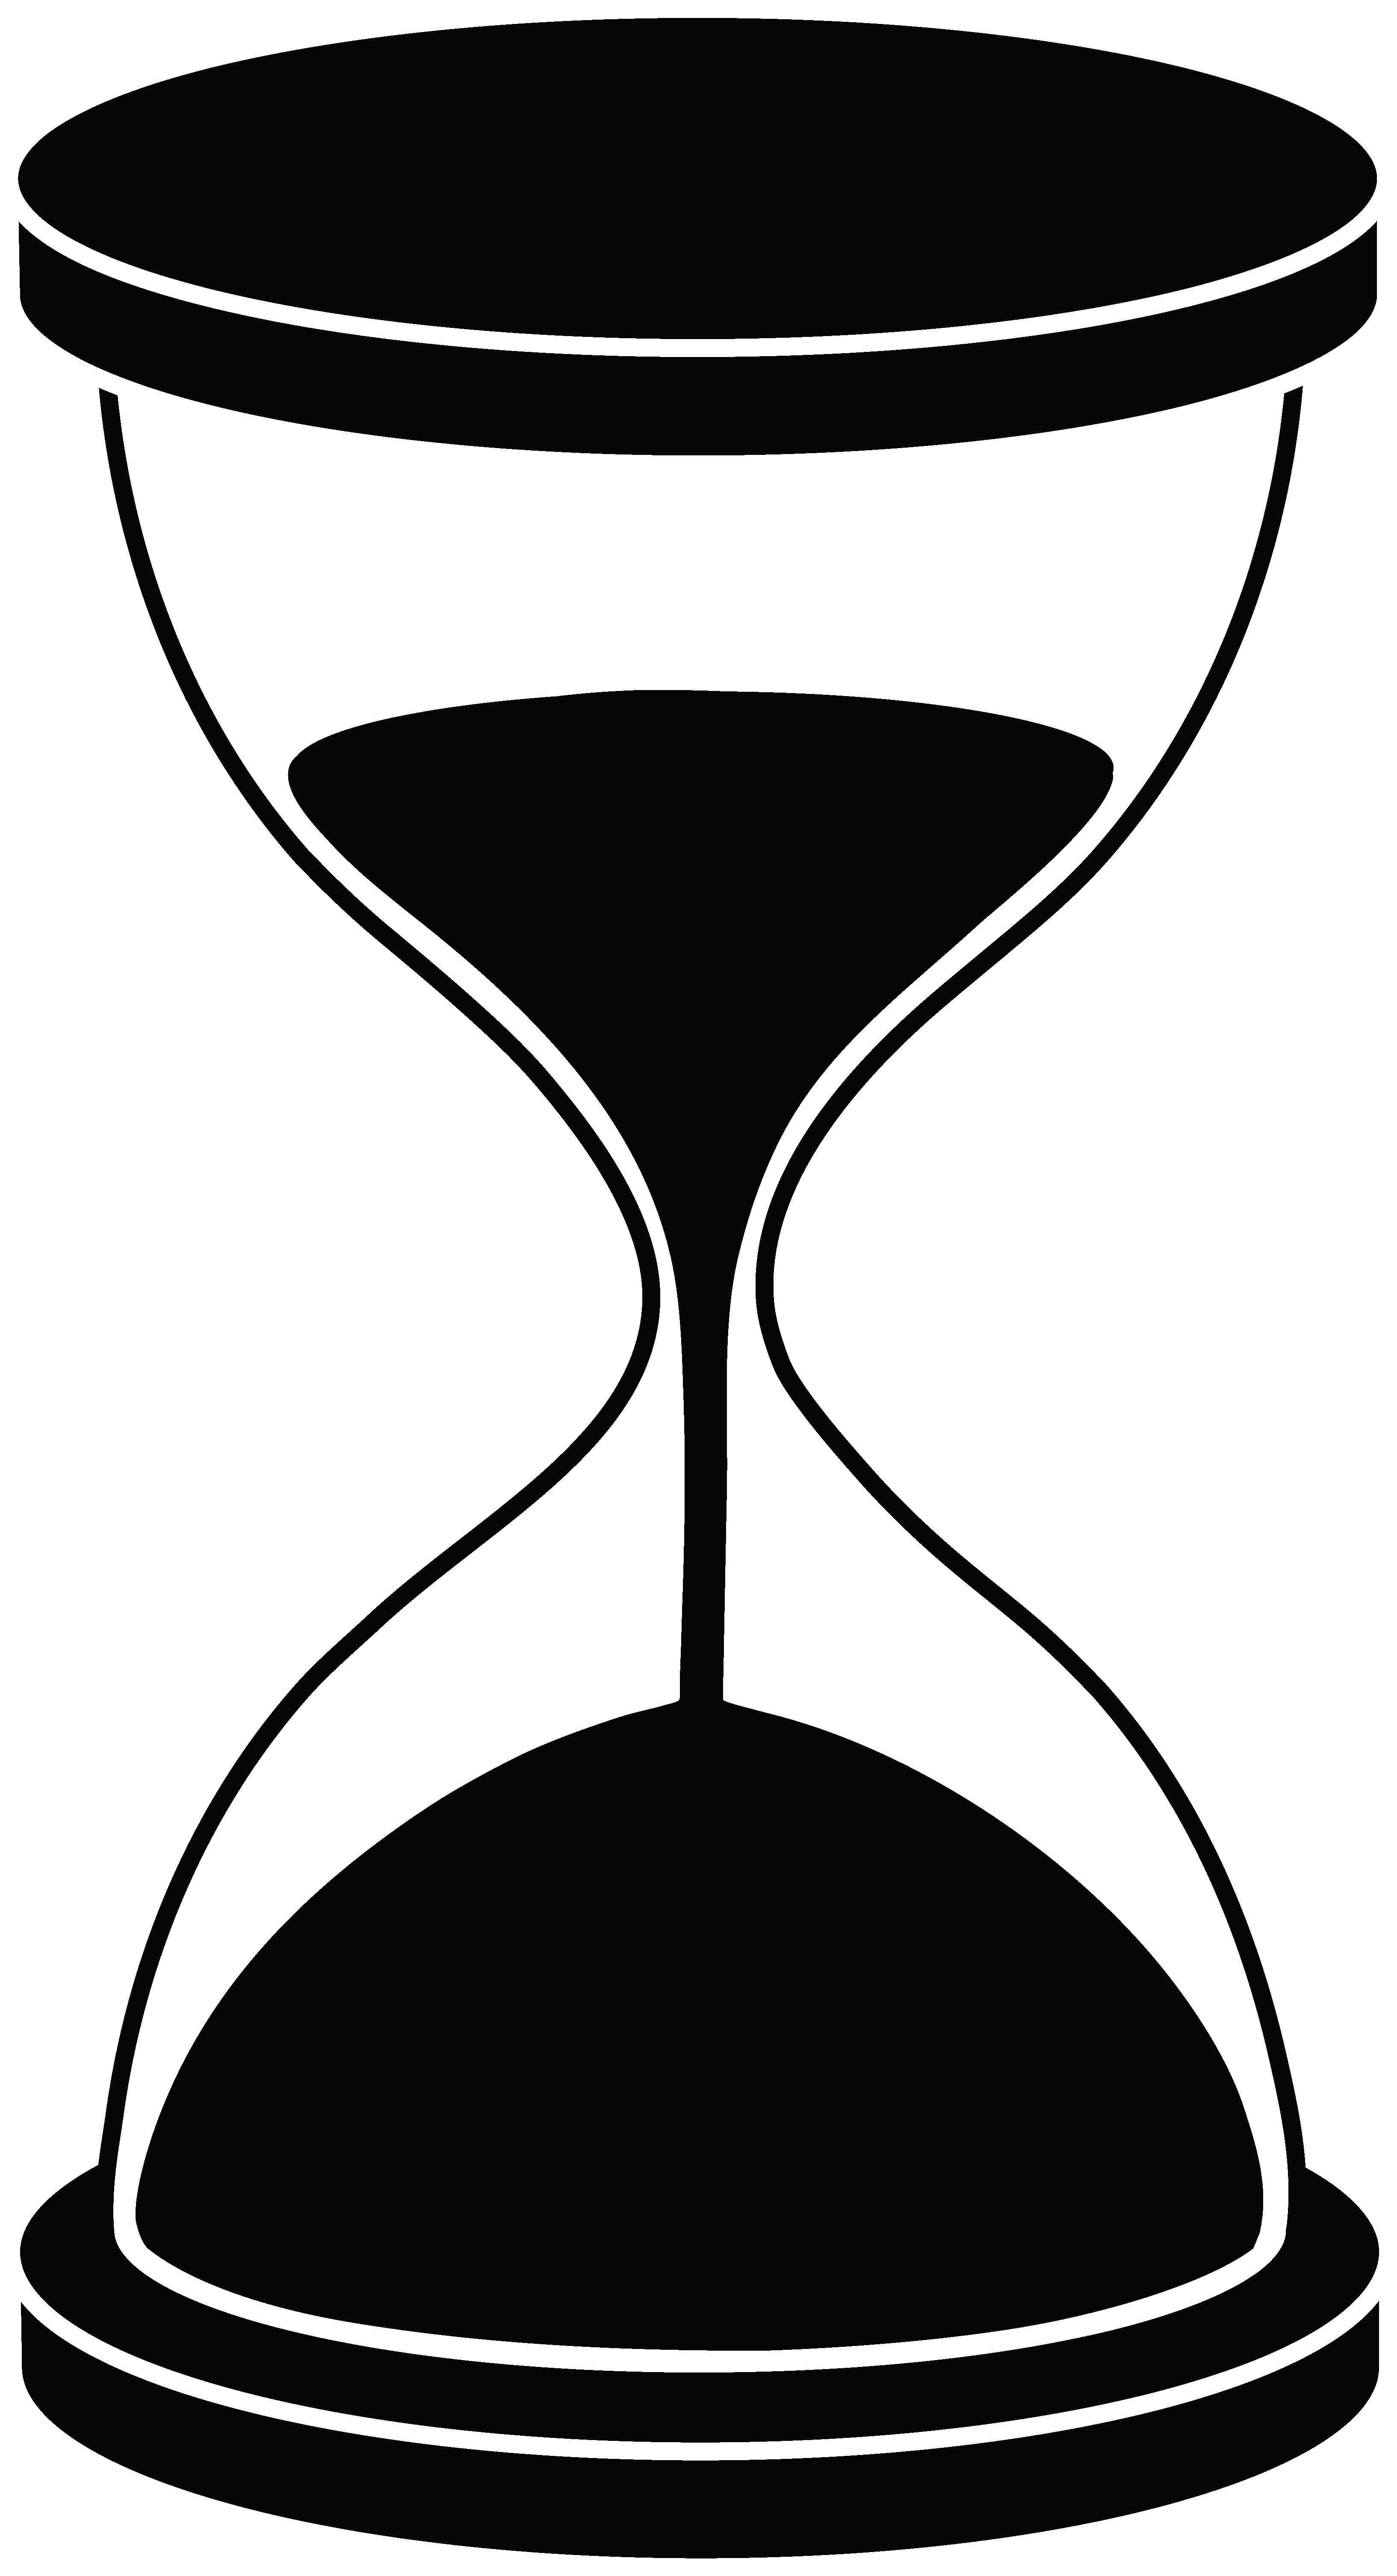 Glass clipart file. Hourglass silhouette free clip